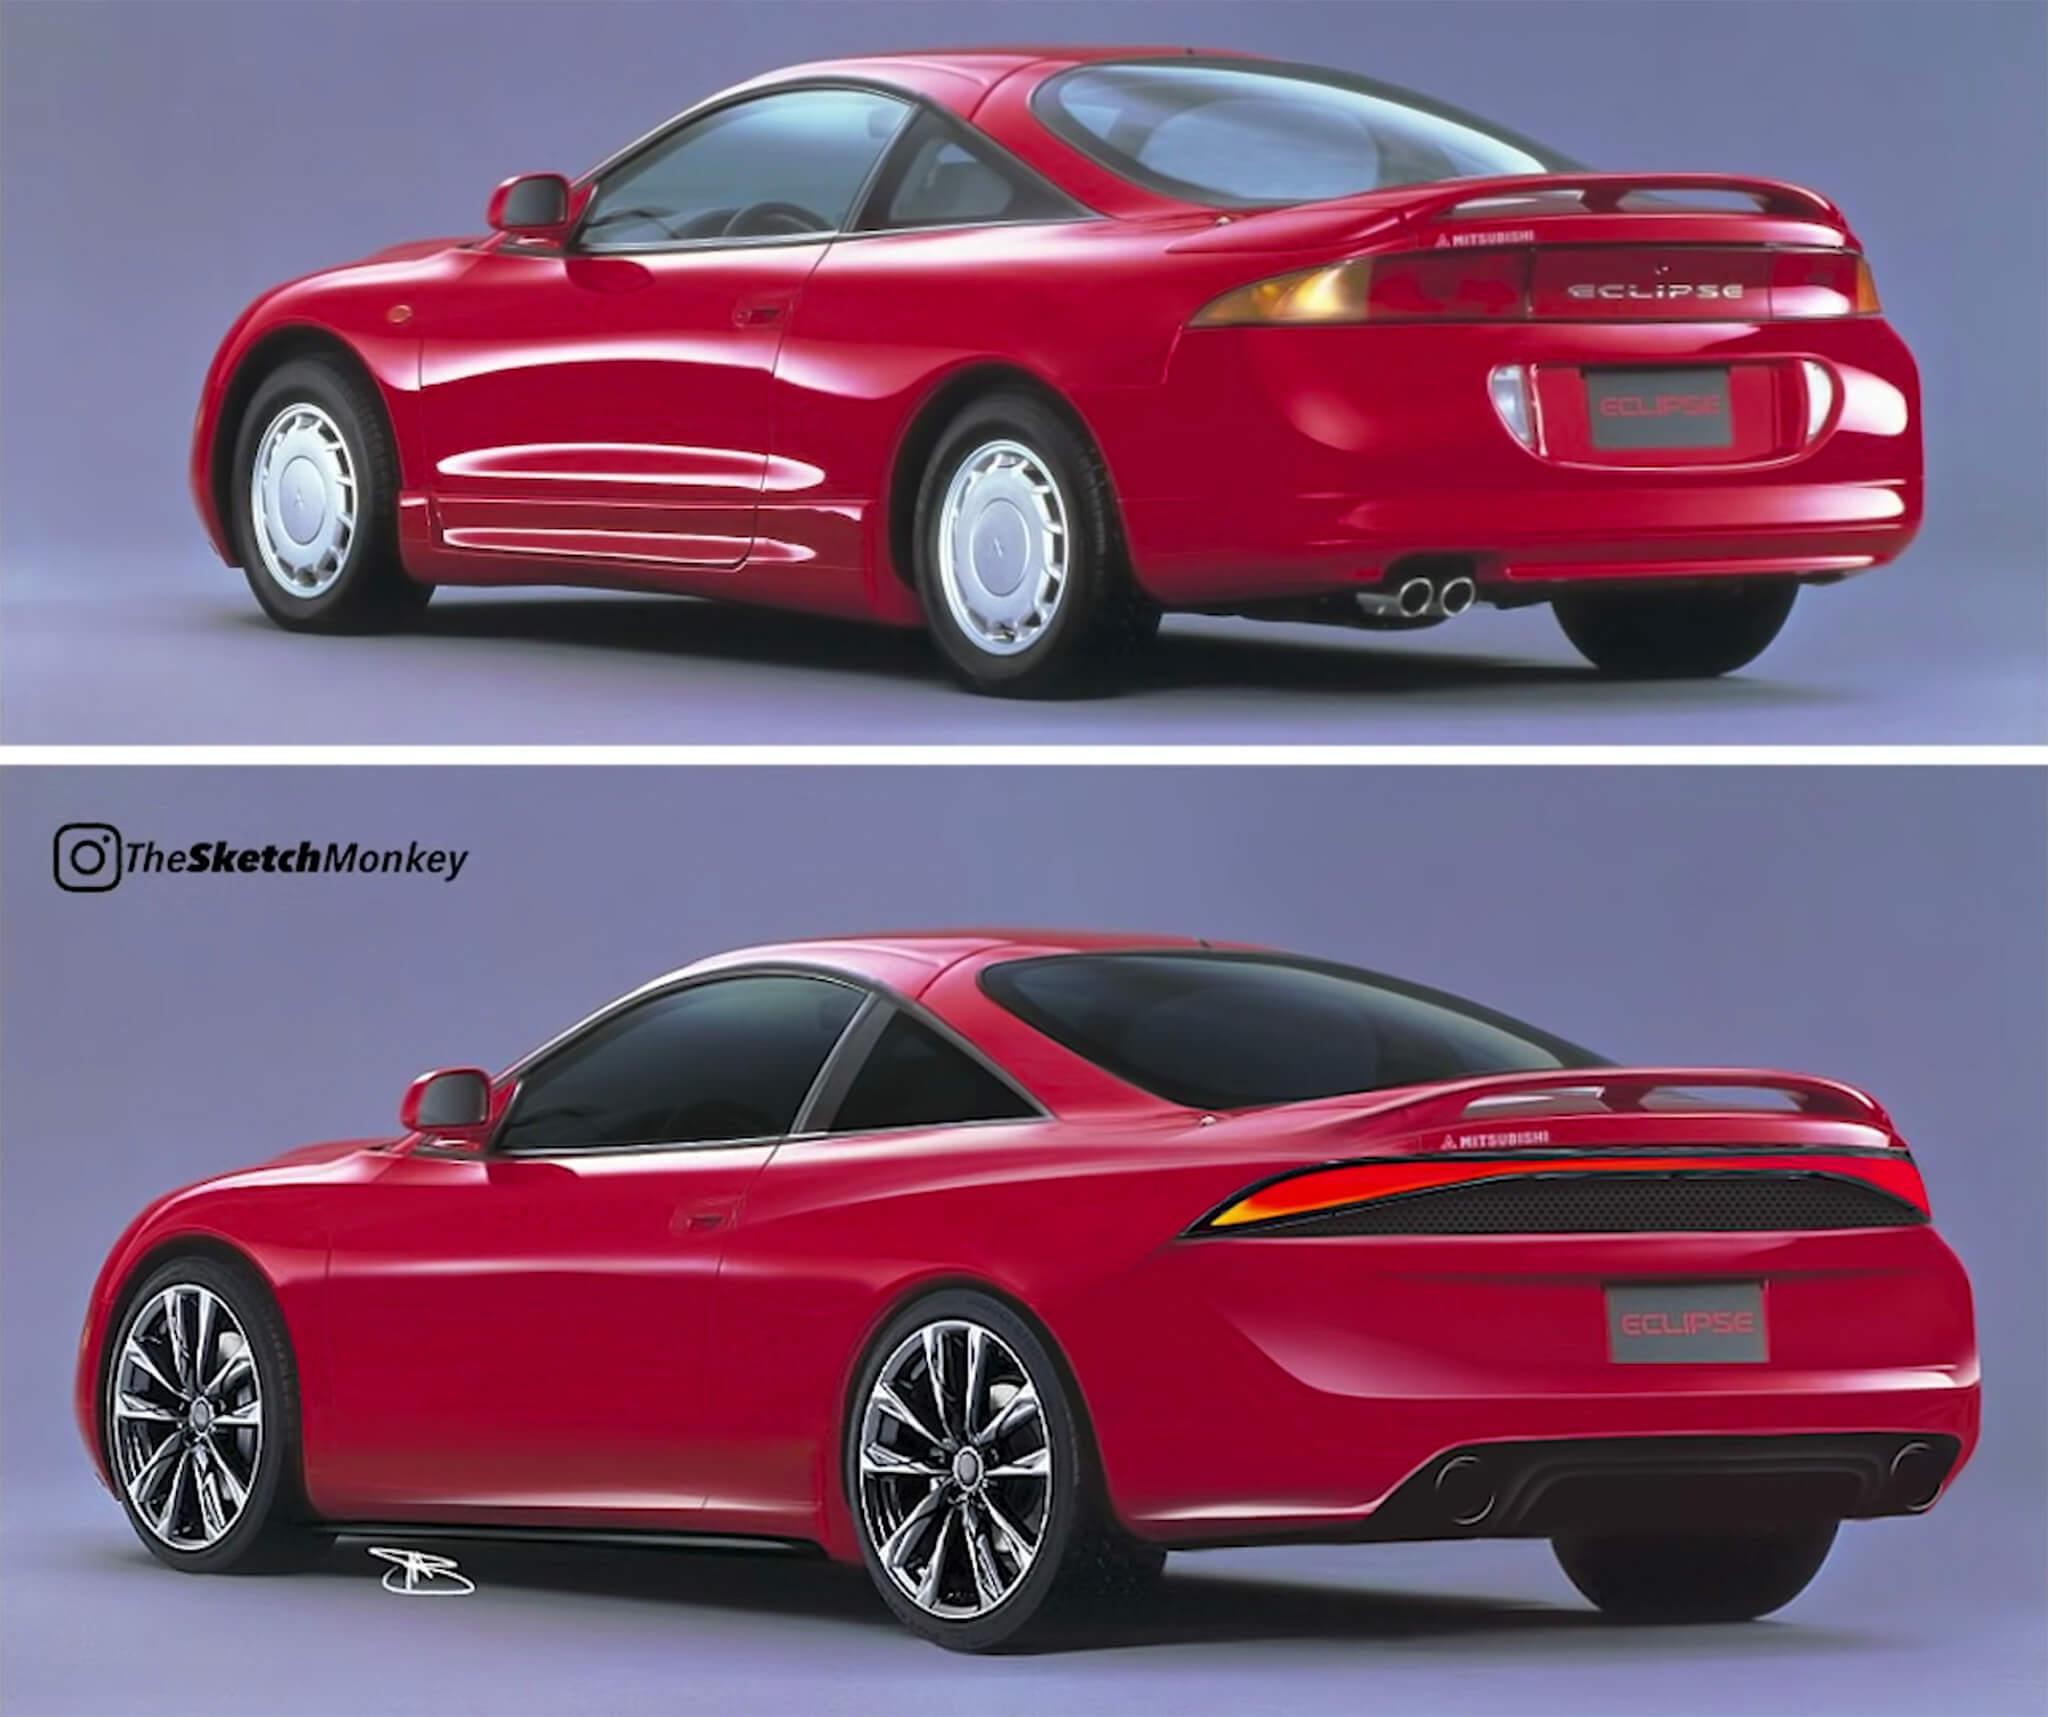 Mitsubishi Eclipse redesign